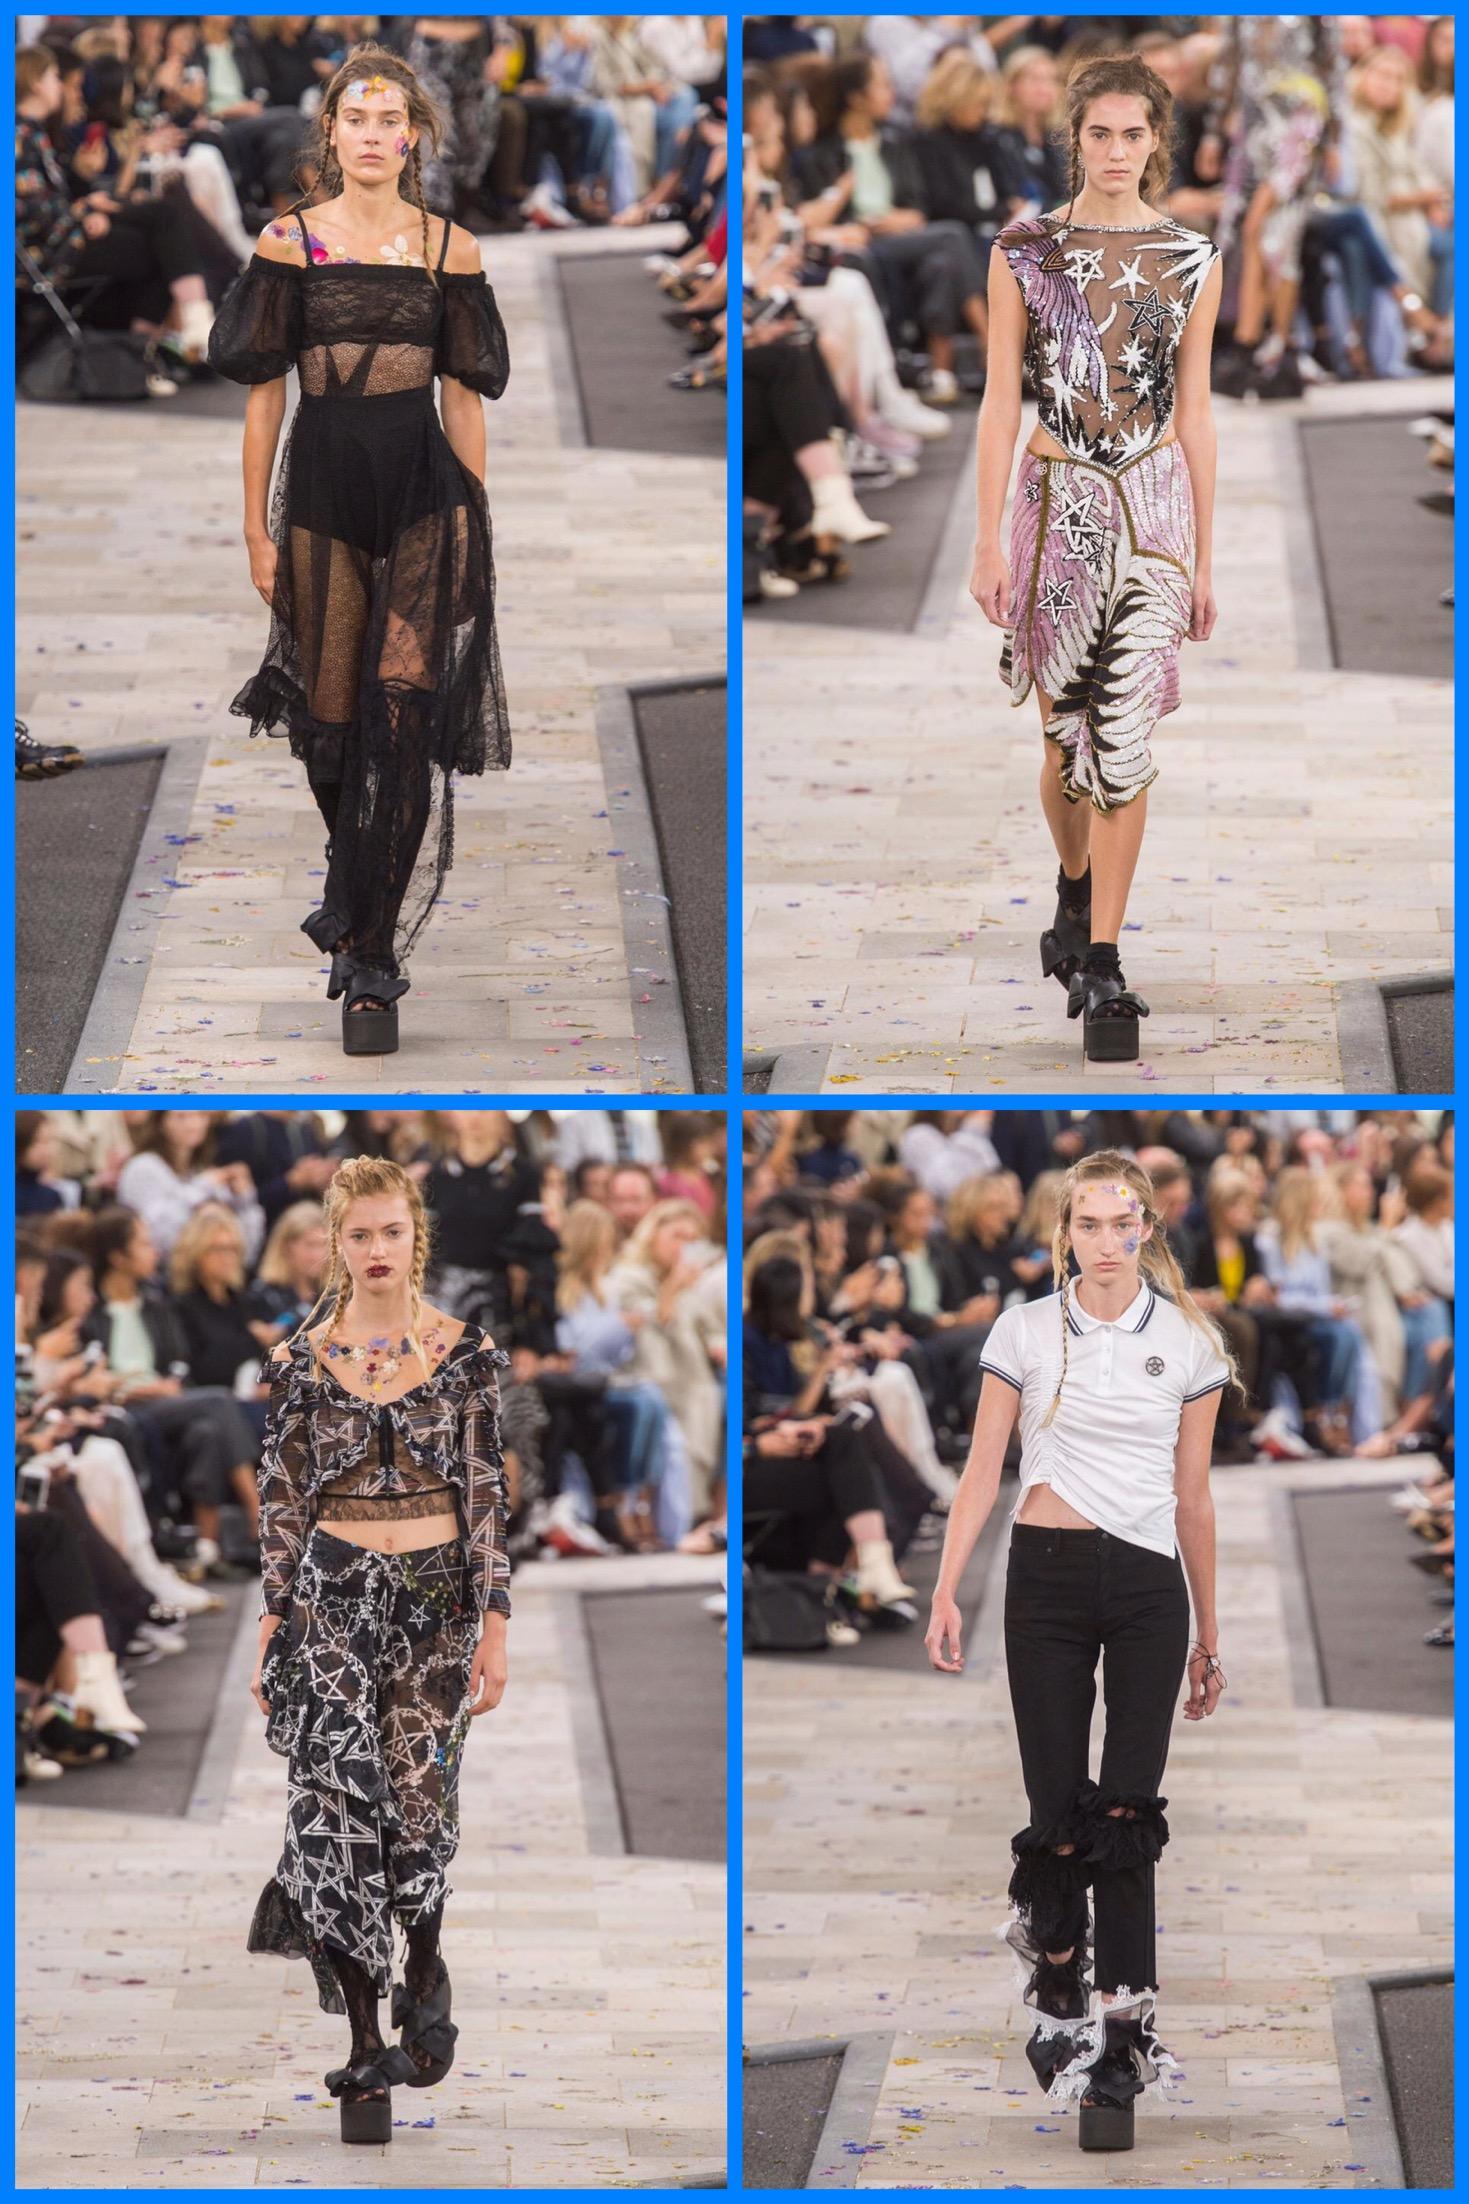 london-fashion-week-pret-a-porter-spring-summer-2017-style-preen-by-thornton-bregazzi